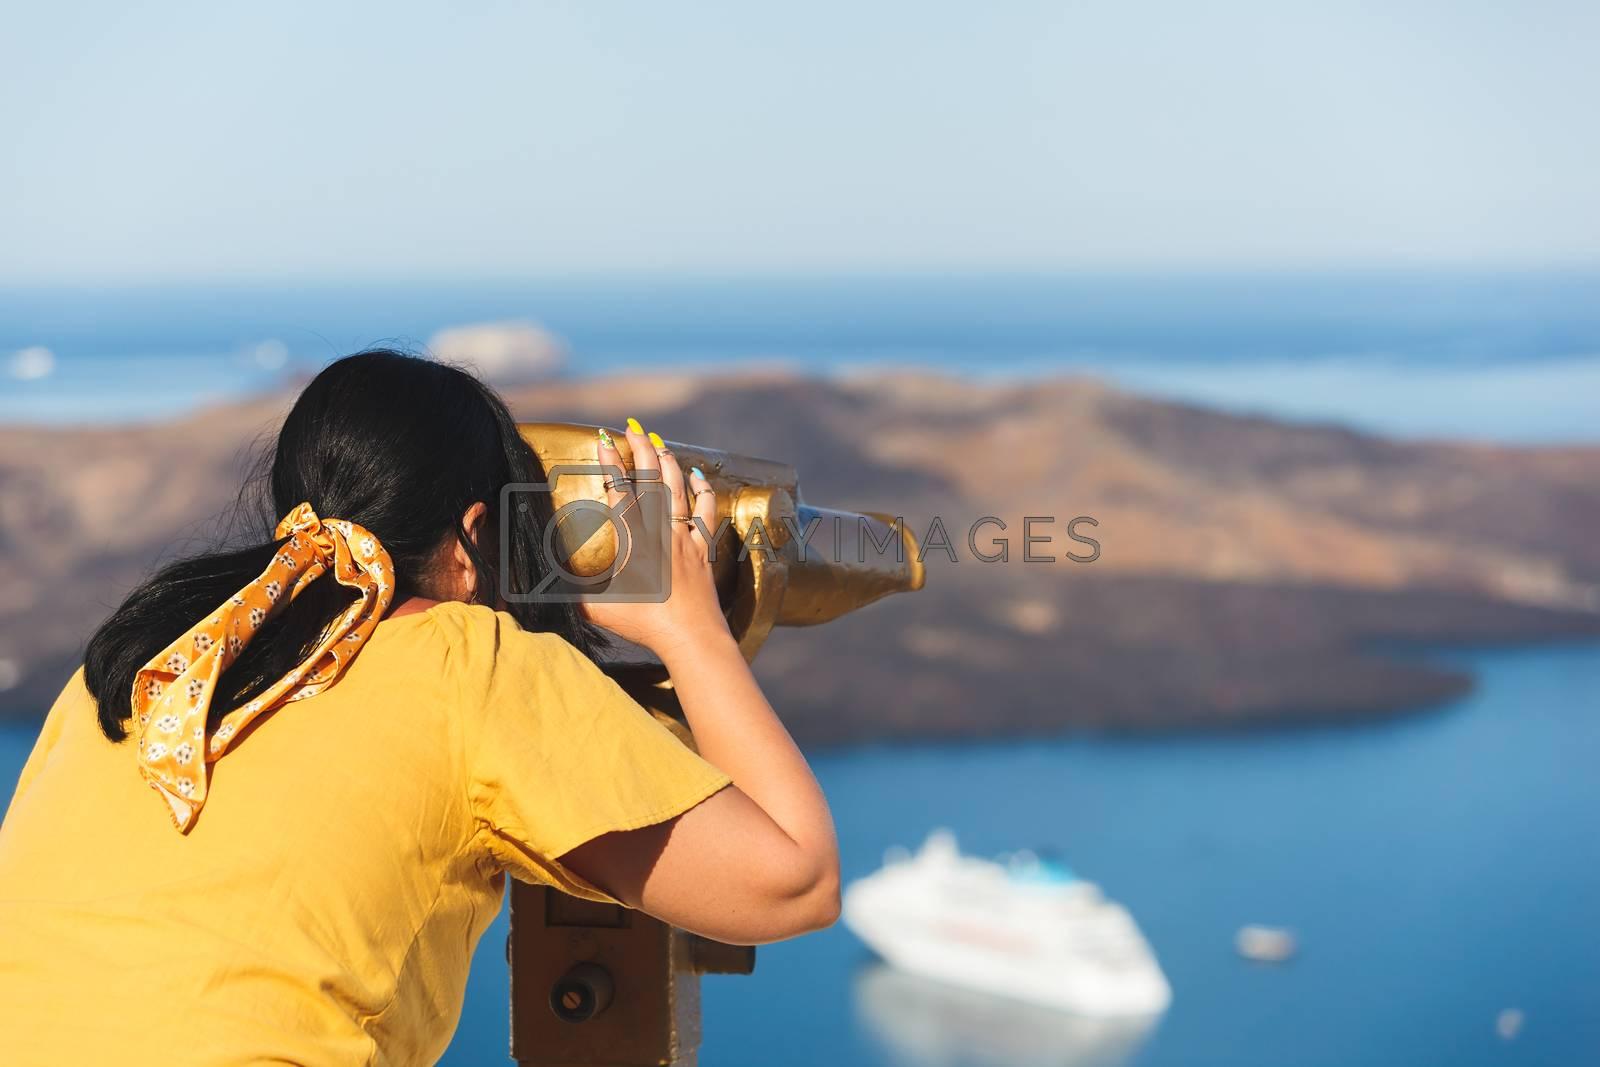 Beautiful young woman looking at cruise ships with binoculars in Thira, Santorini, Greece  enjoying vacation, selective focus